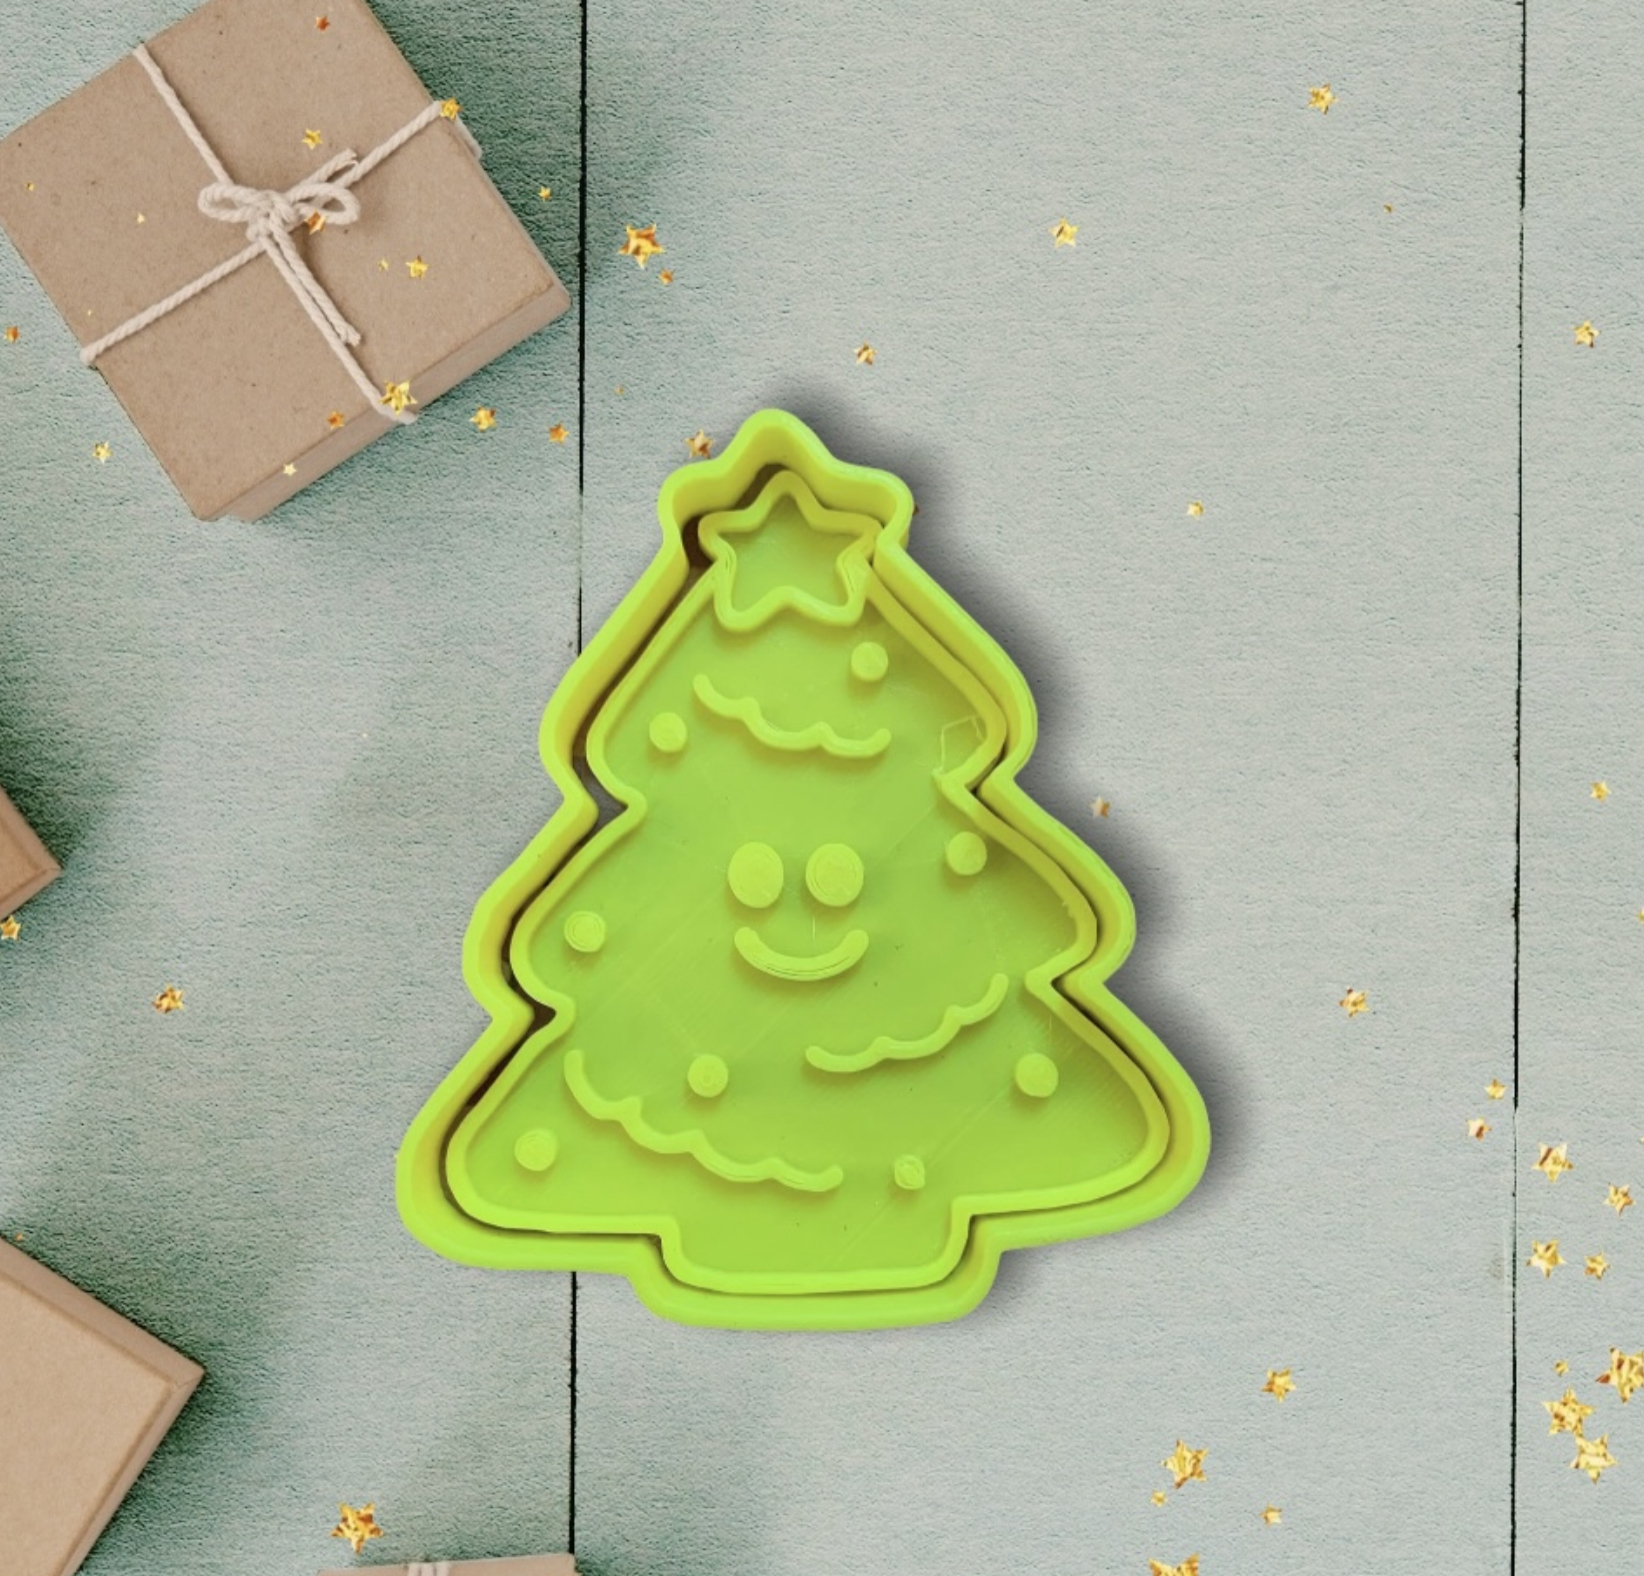 2454DC9B-923C-41EE-98D7-85A9CD7CA65A.jpeg Download STL file Cookie Cutter Christmas Tree • 3D printer template, carloseduardoalfonsogarcia